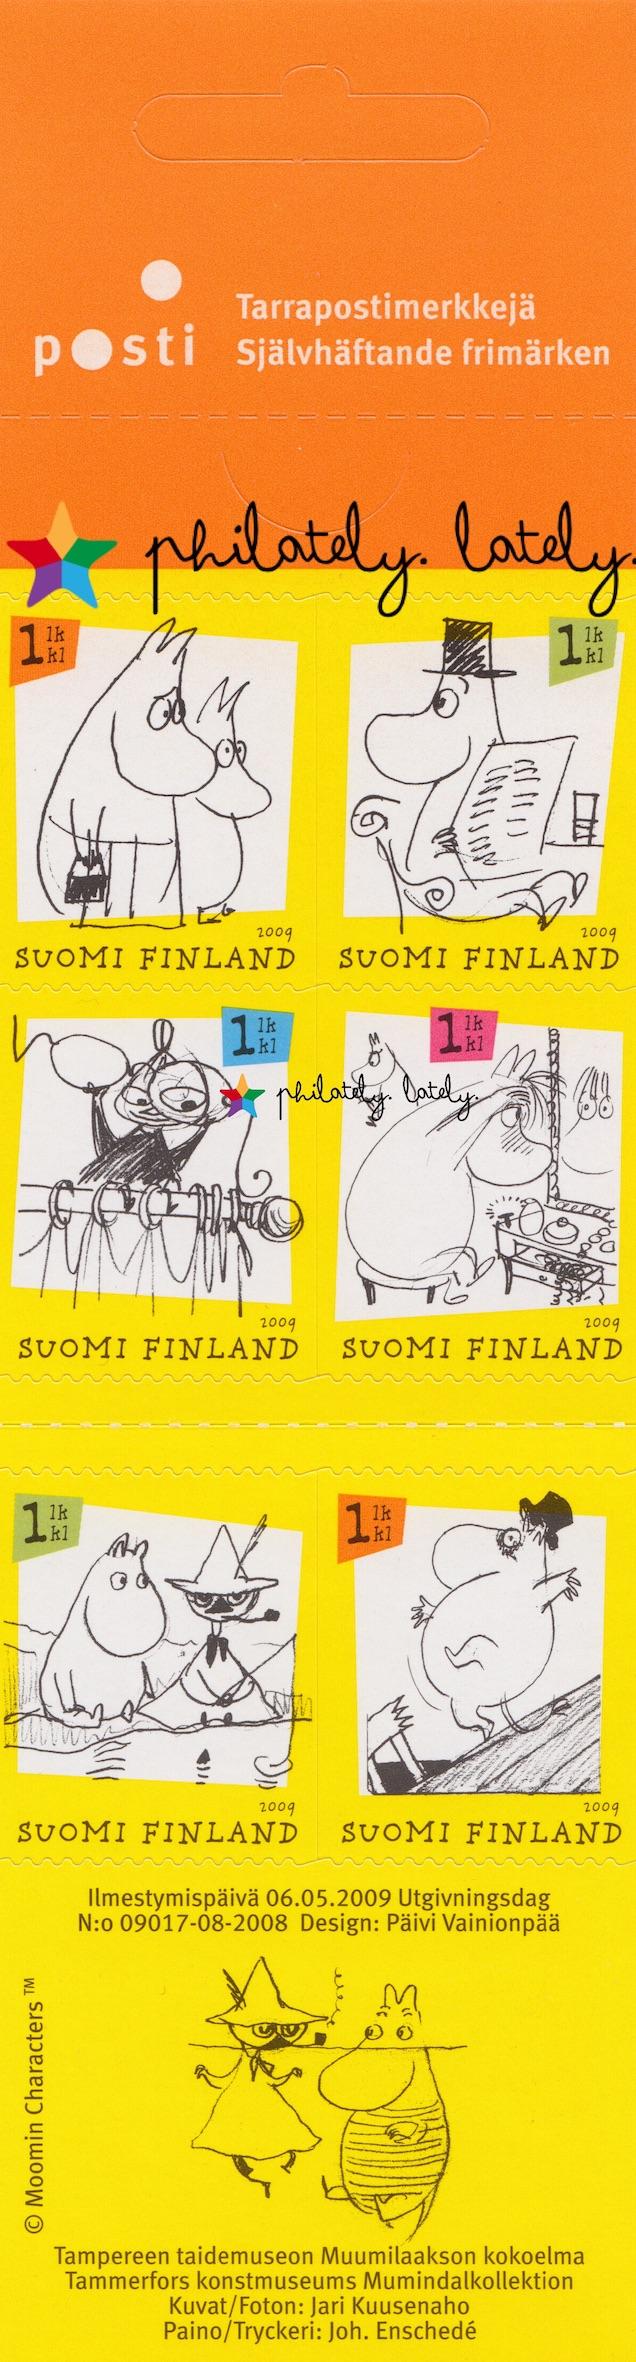 001_Finland_Moomin_Stamps.jpg